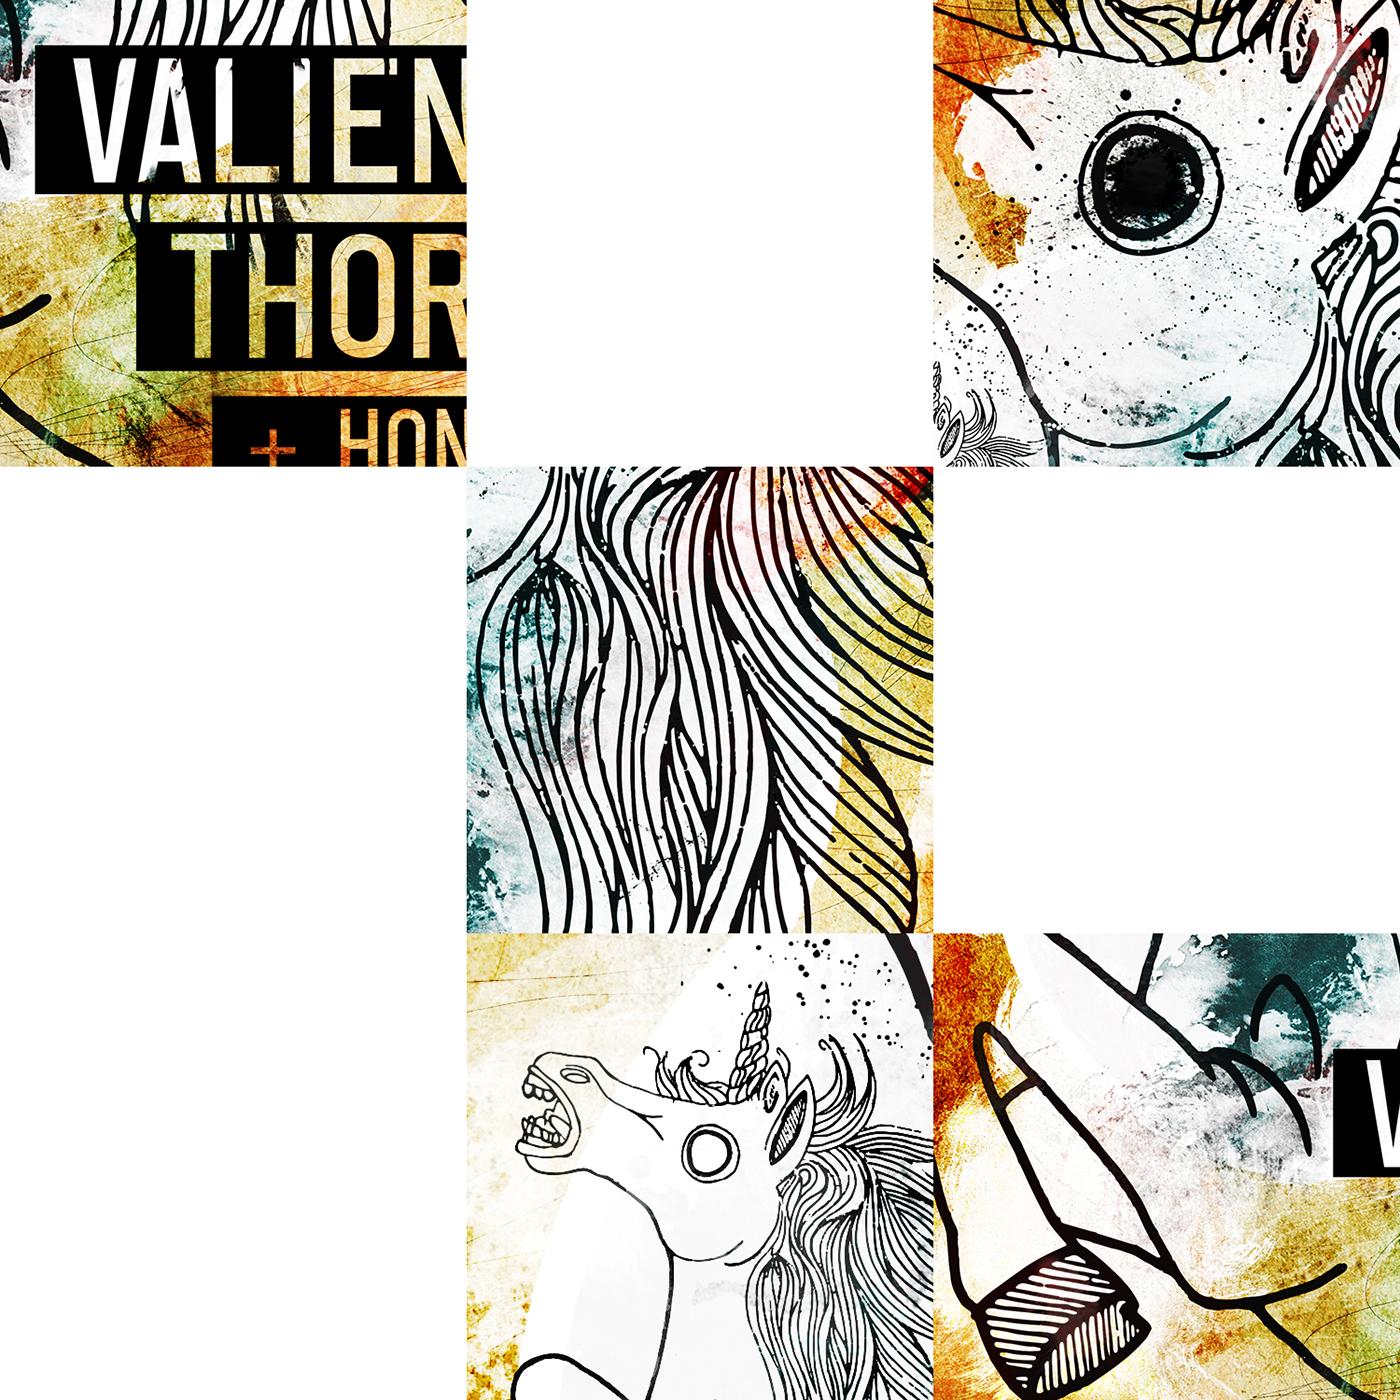 valient thorr HONKY poster berlin unicorn grunge dirty music